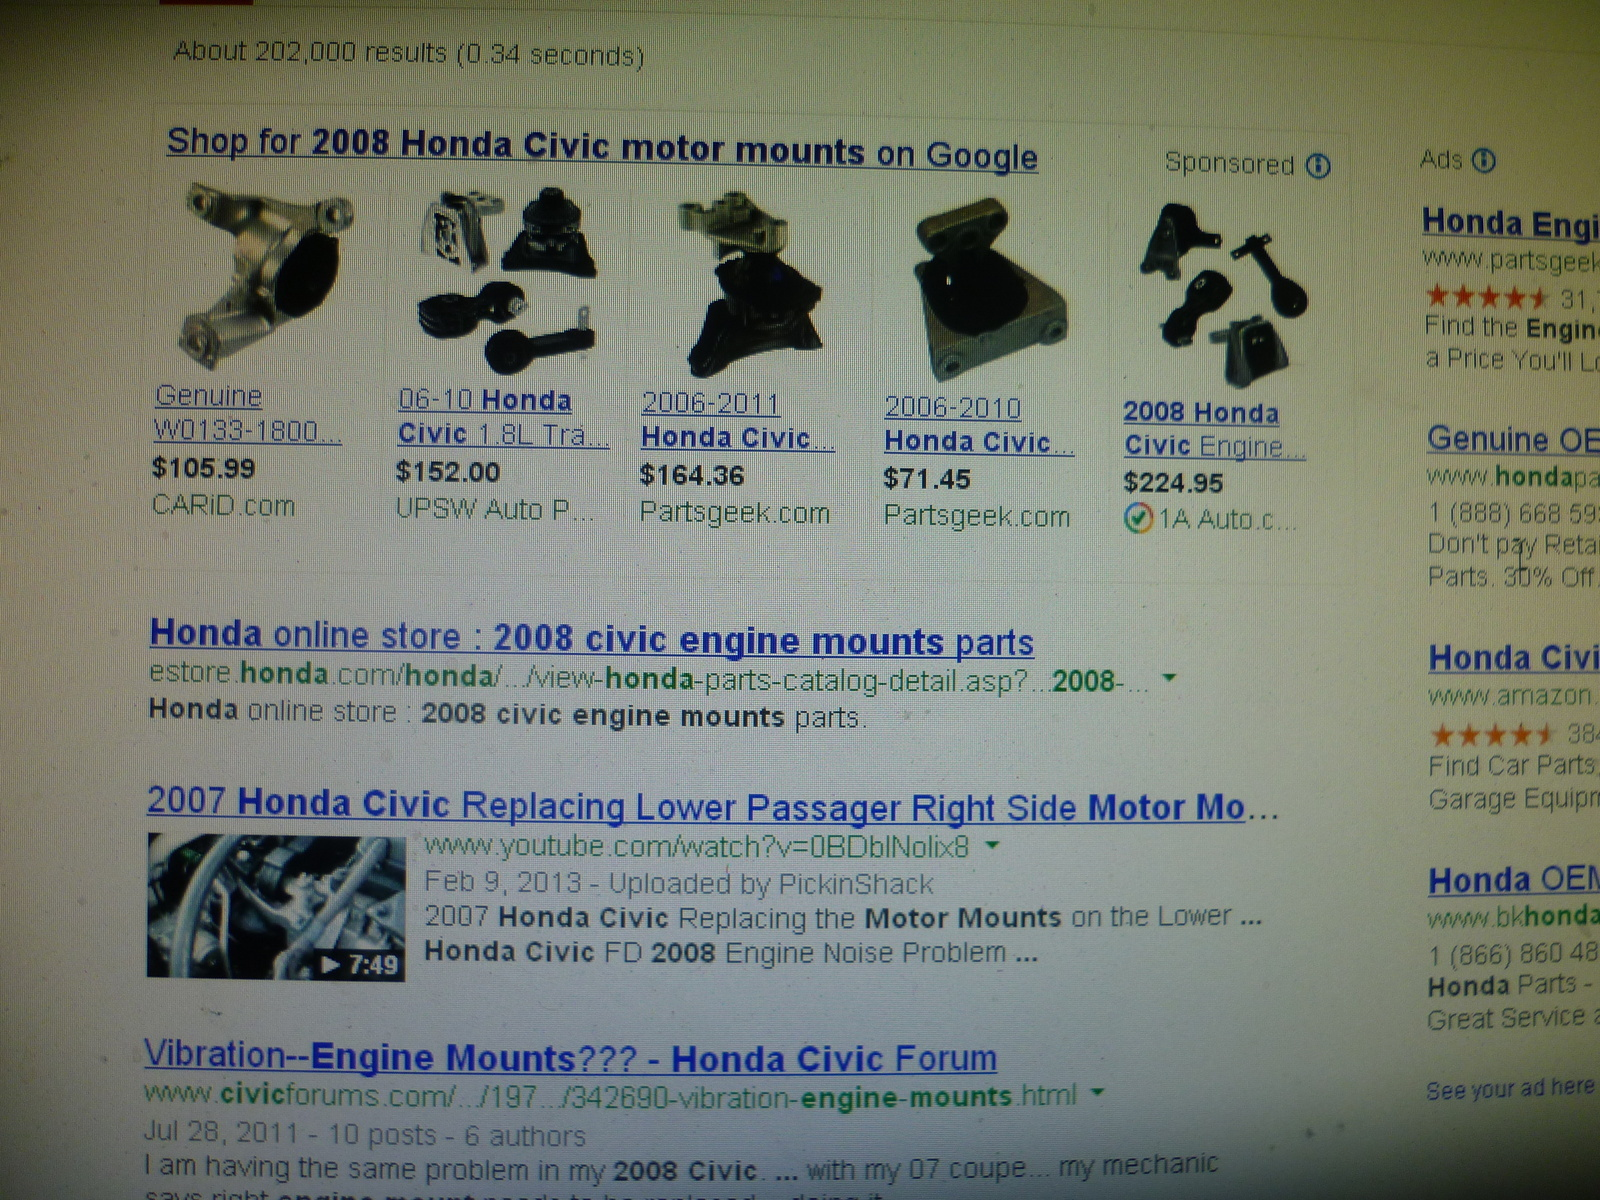 images?q=tbn:ANd9GcQh_l3eQ5xwiPy07kGEXjmjgmBKBRB7H2mRxCGhv1tFWg5c_mWT 2008 Honda Civic Engine Parts Diagram